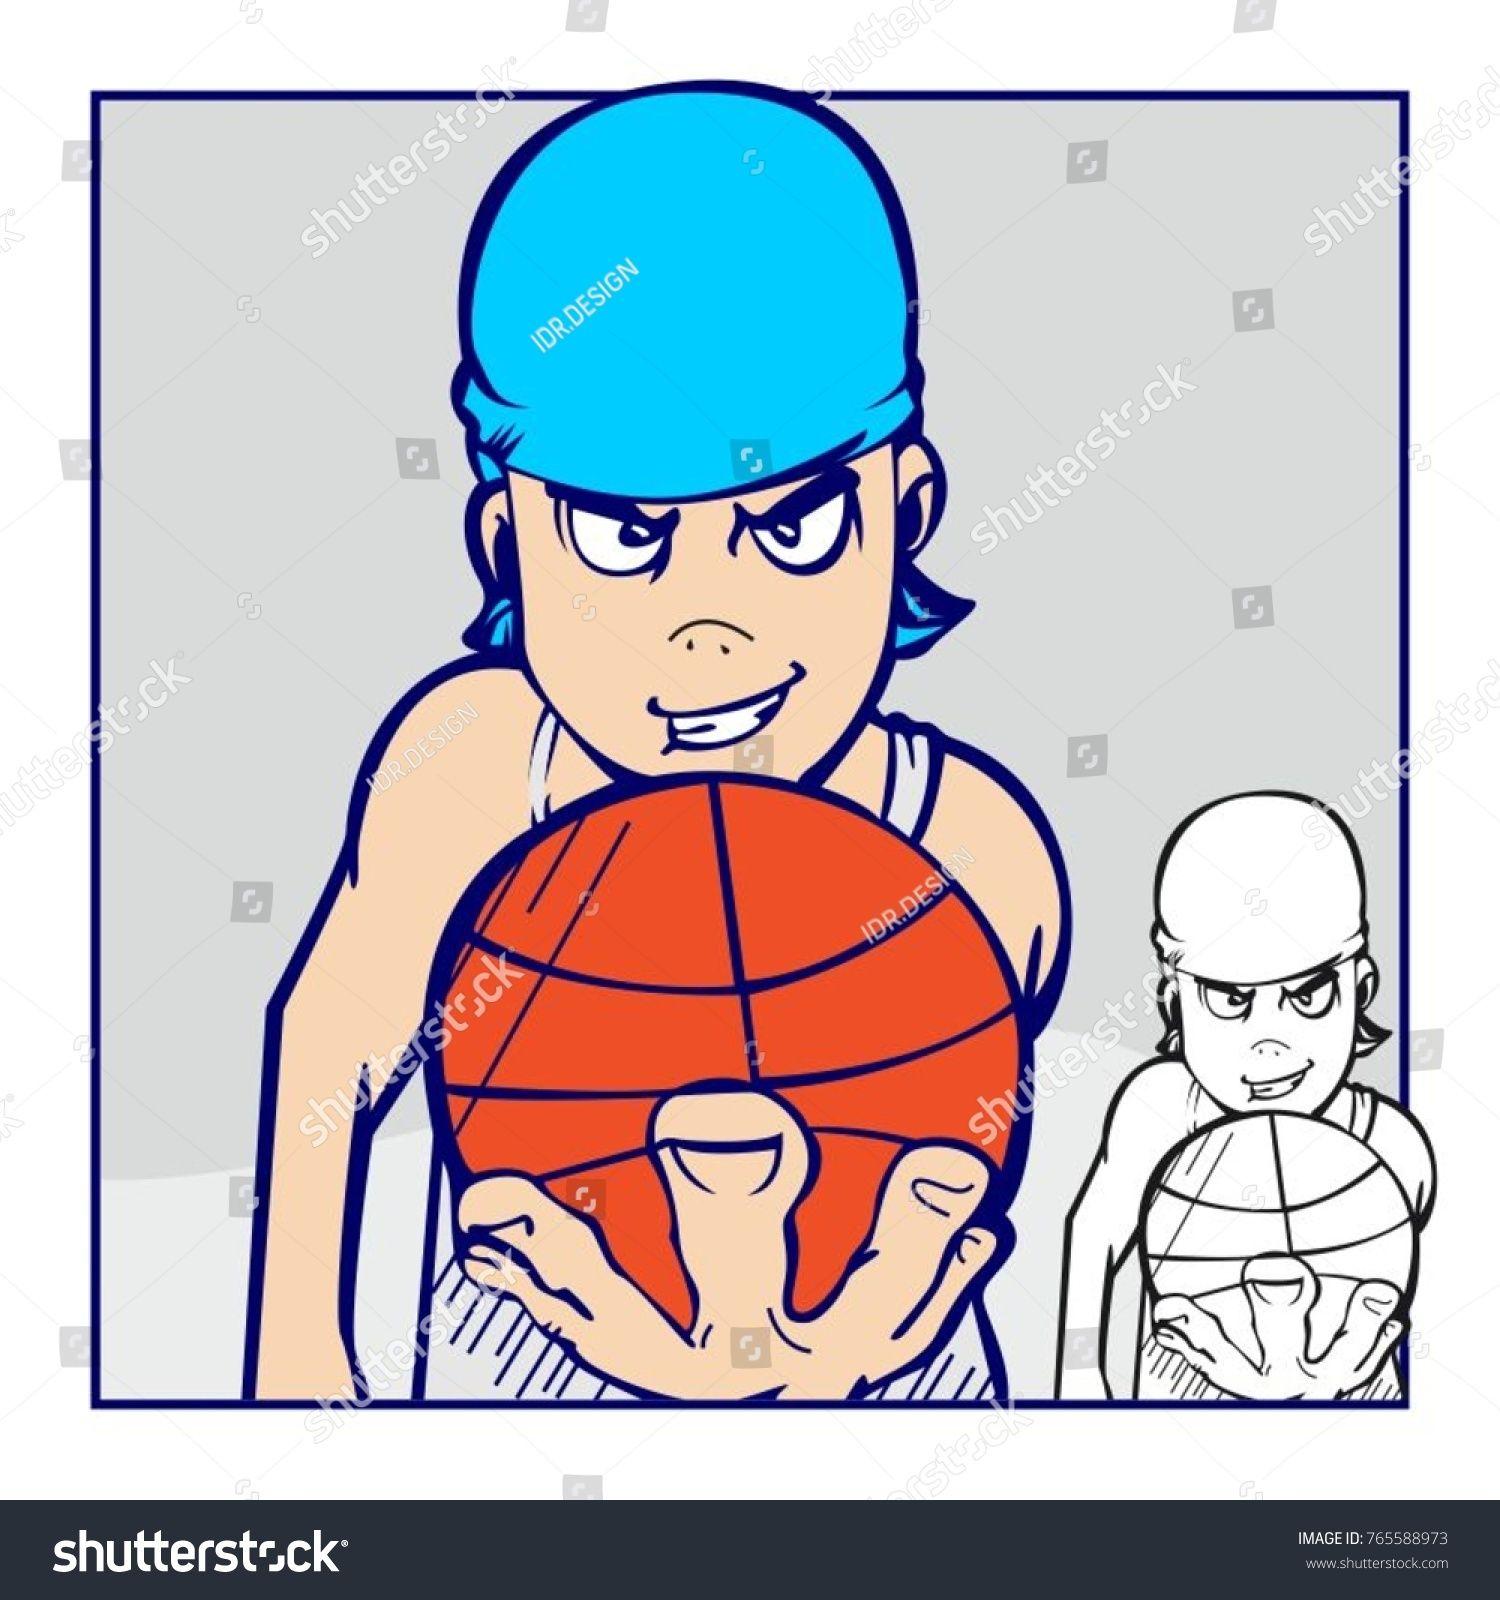 Vector illustration comic basketball player